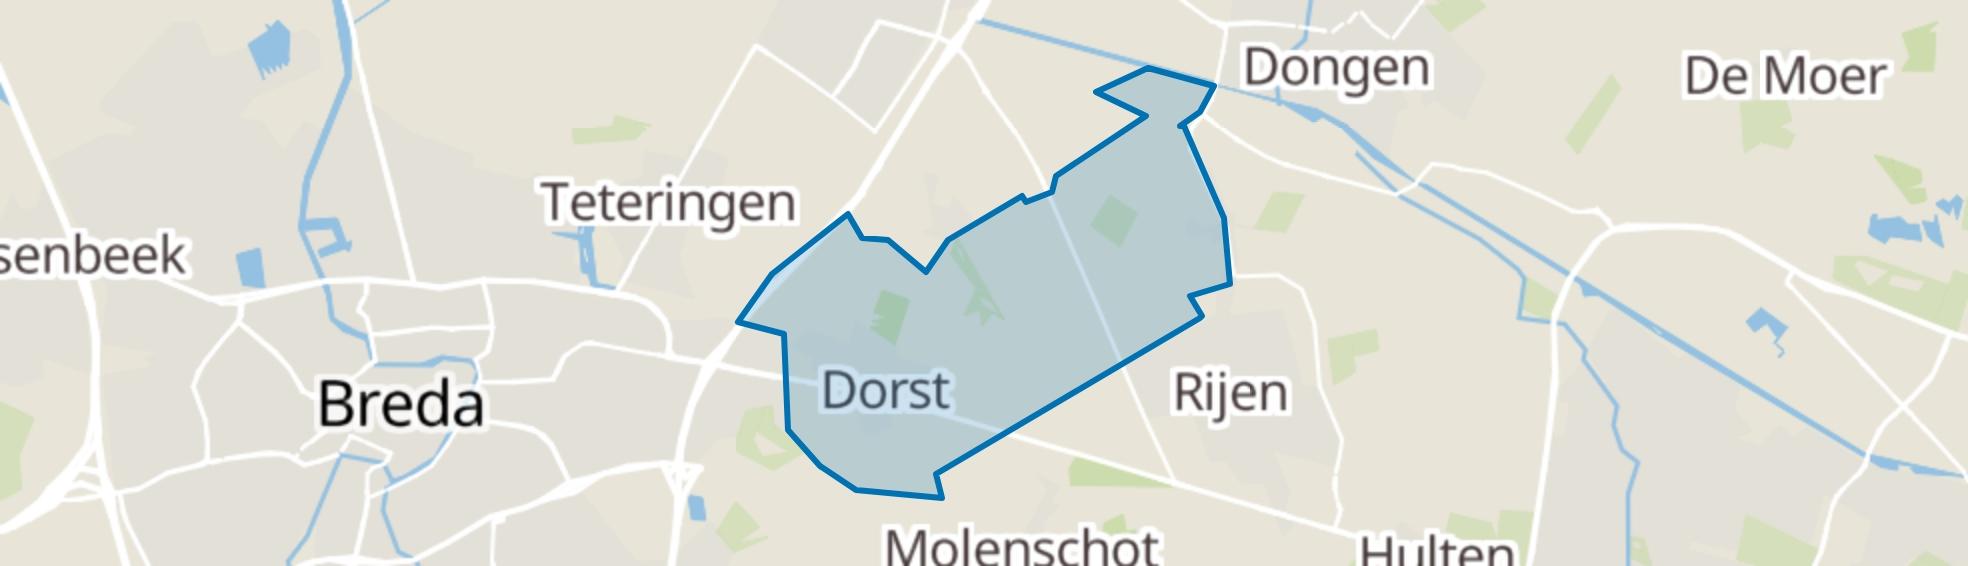 Dorst map